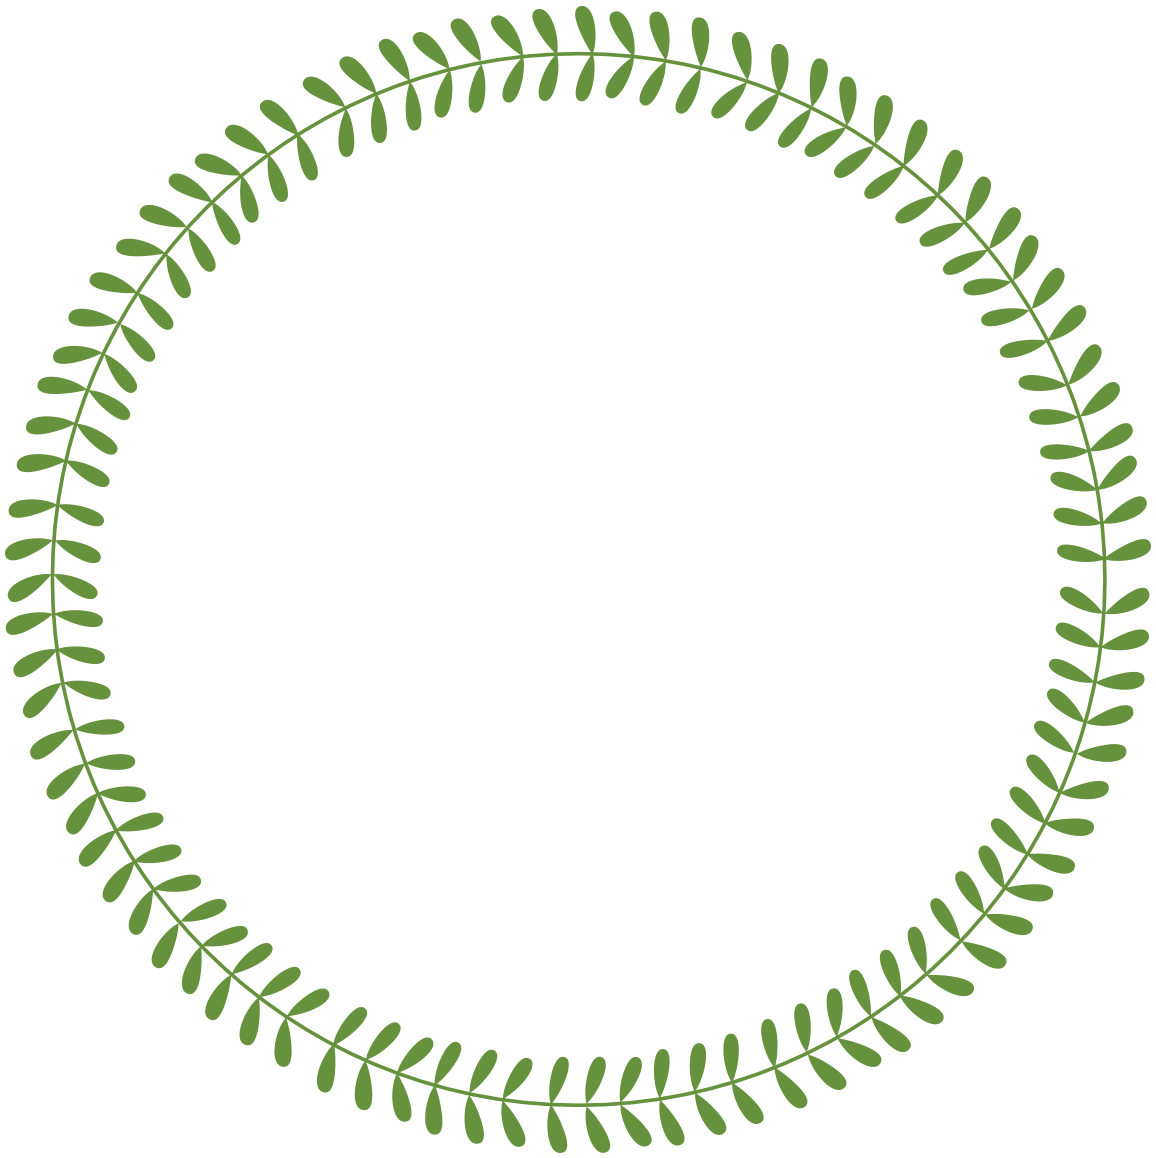 Free laurel frames arrows. Arrow circle frame clipart